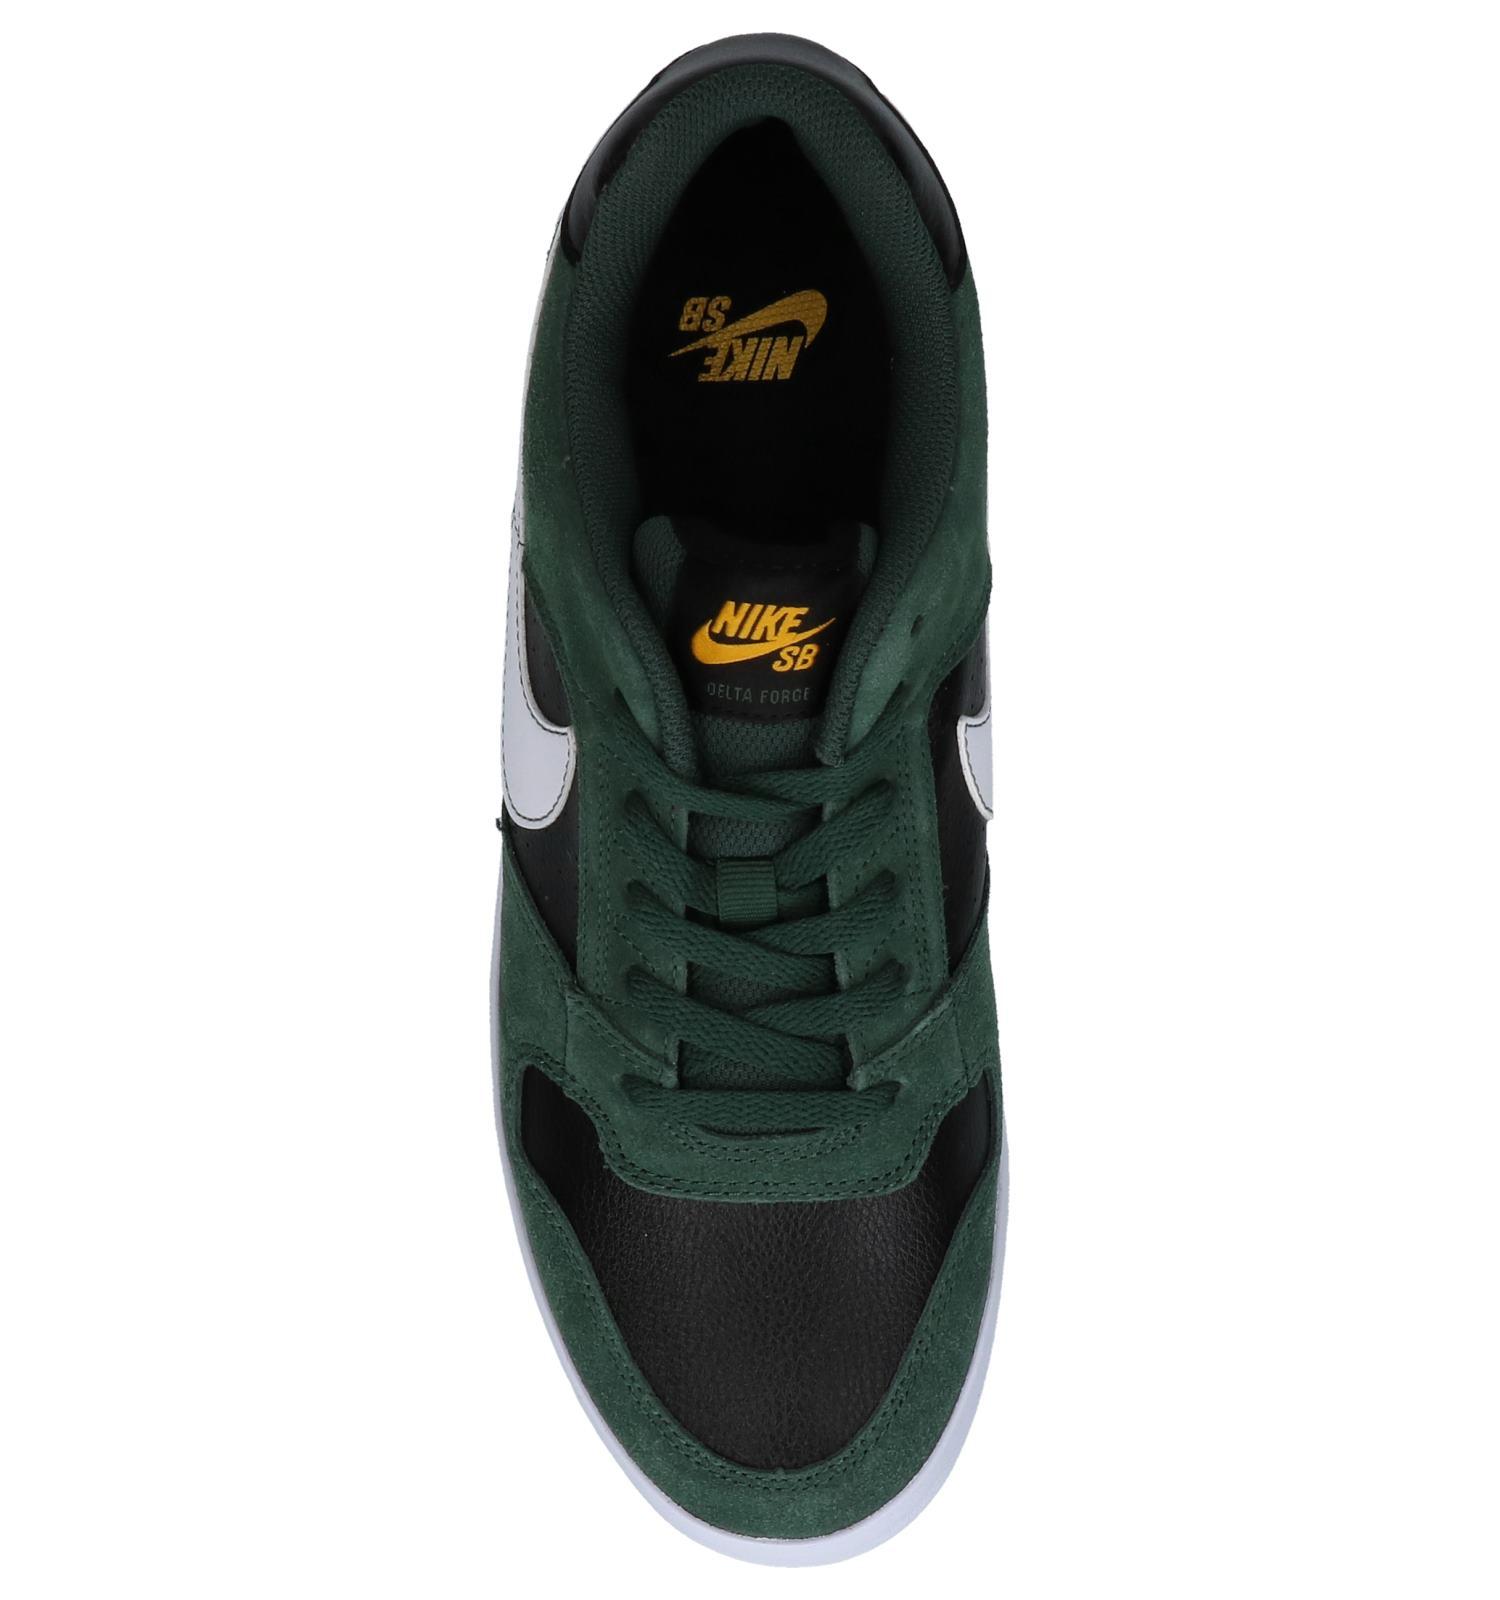 Groene En Delta Force Sb Verzend Retour be Nike Gratis Donker Sneakers Torfs wAIxqWTvZ